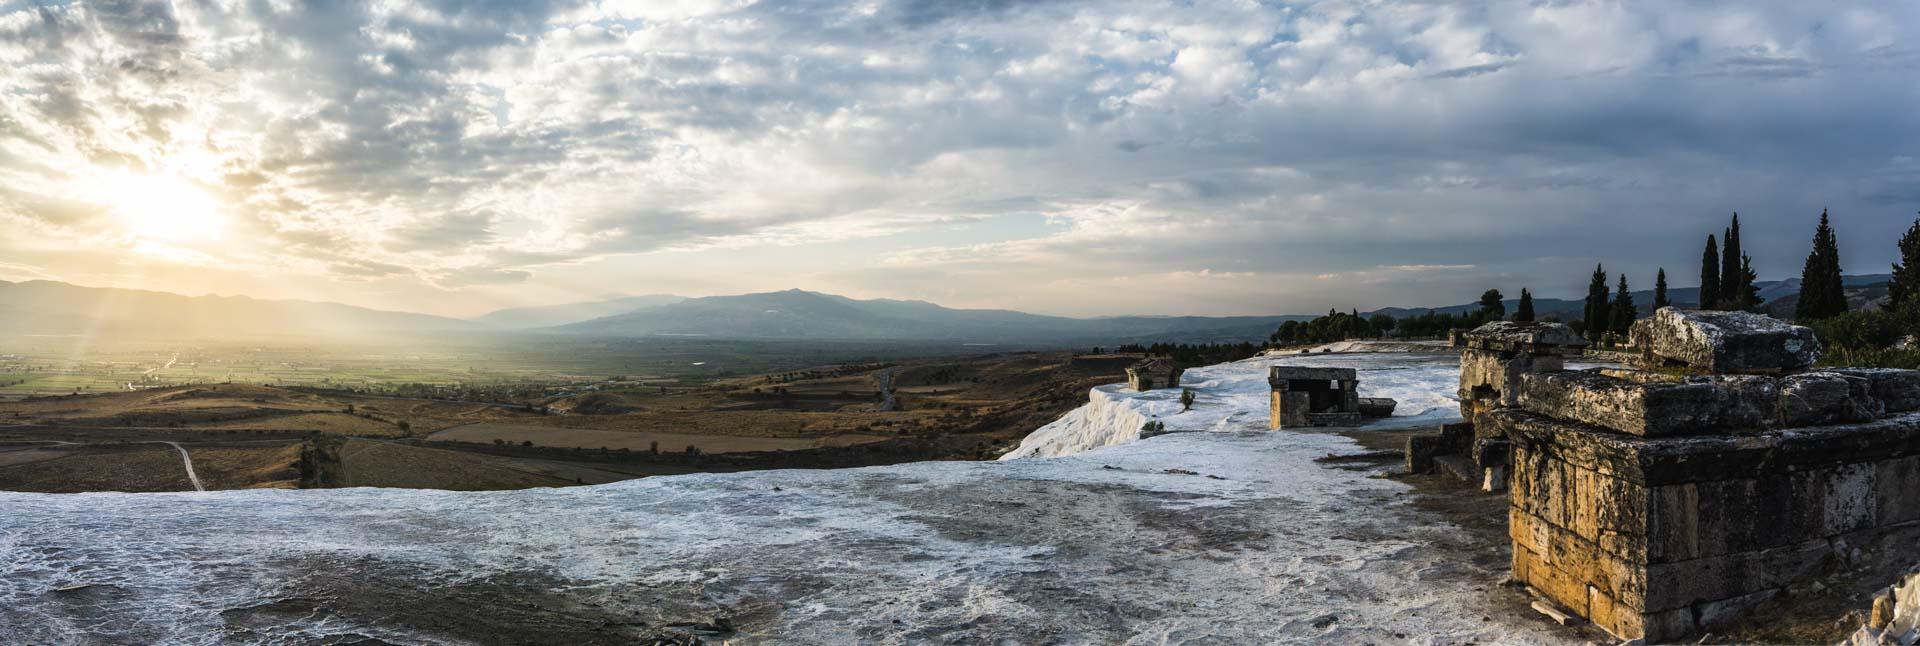 Turquie pamukkale hierapolis Turkey sunset coucher soleil calcaire serialhikers tour du monde world trip voyage alternatif autostop hitchhiking volontariat volonteering adventure aventure